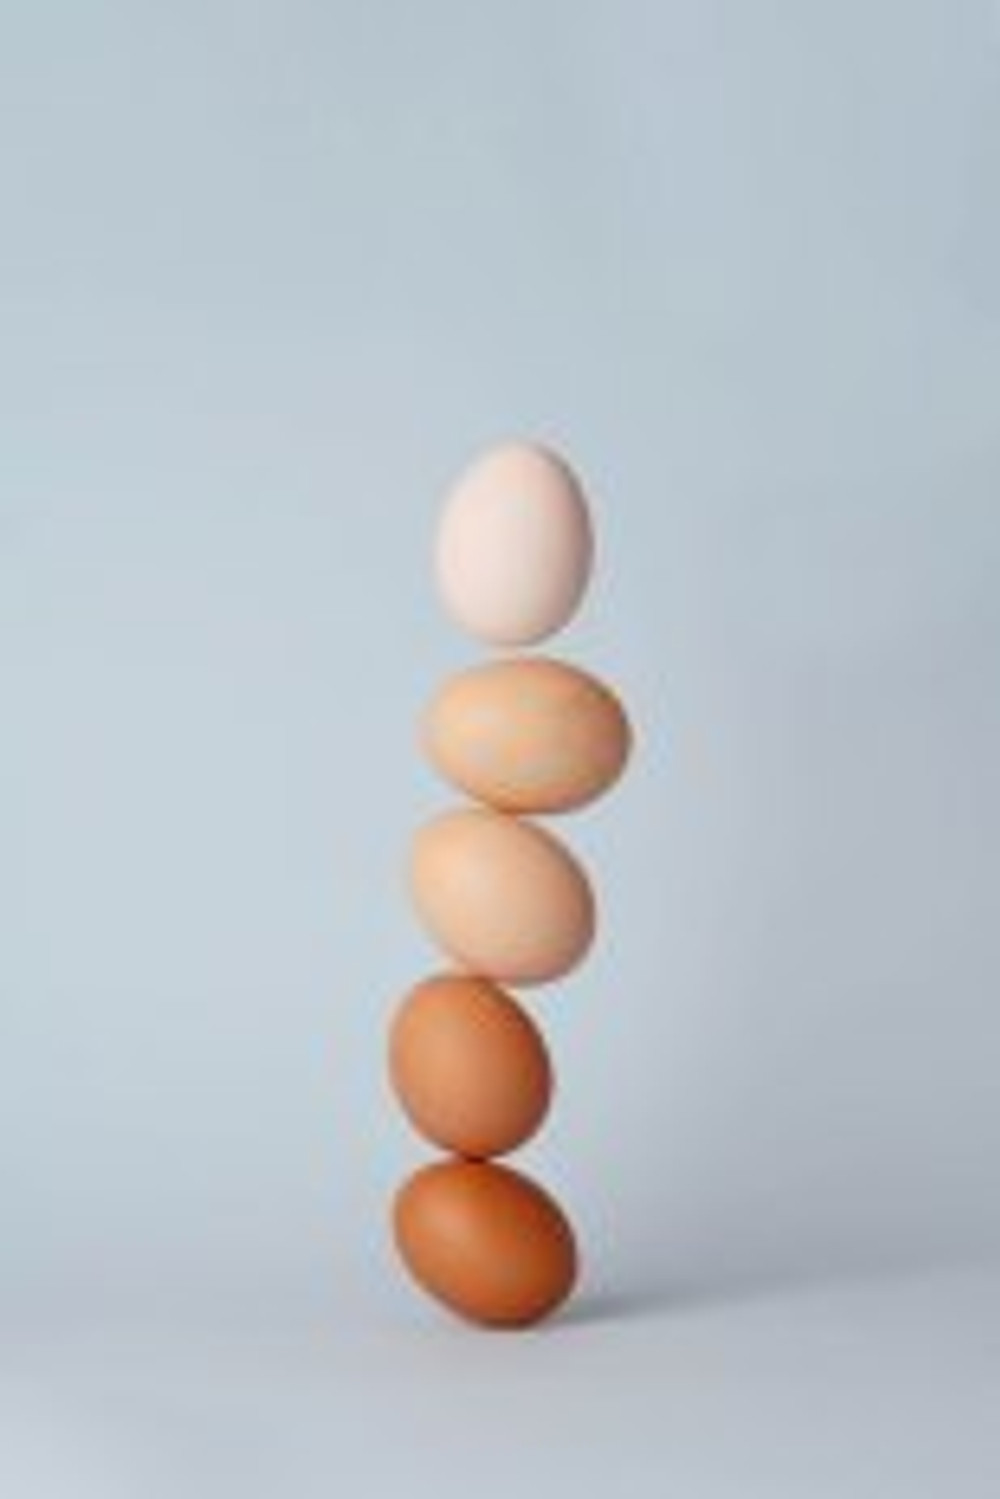 2018-11-25 balance eggs